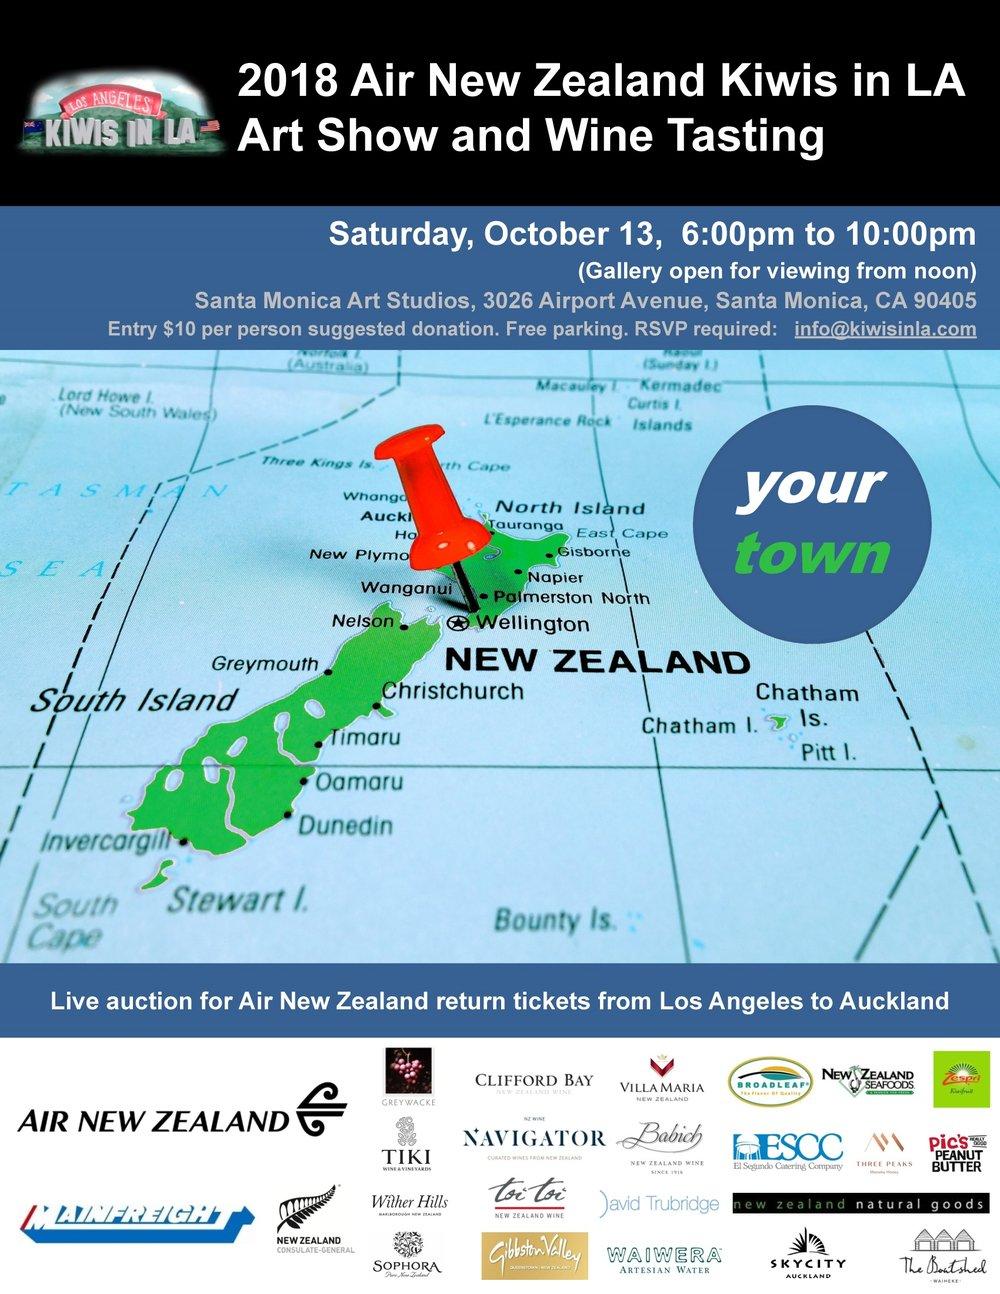 2018 Air New Zealand Kiwis in LA Art Show and Wine Tasting.jpg